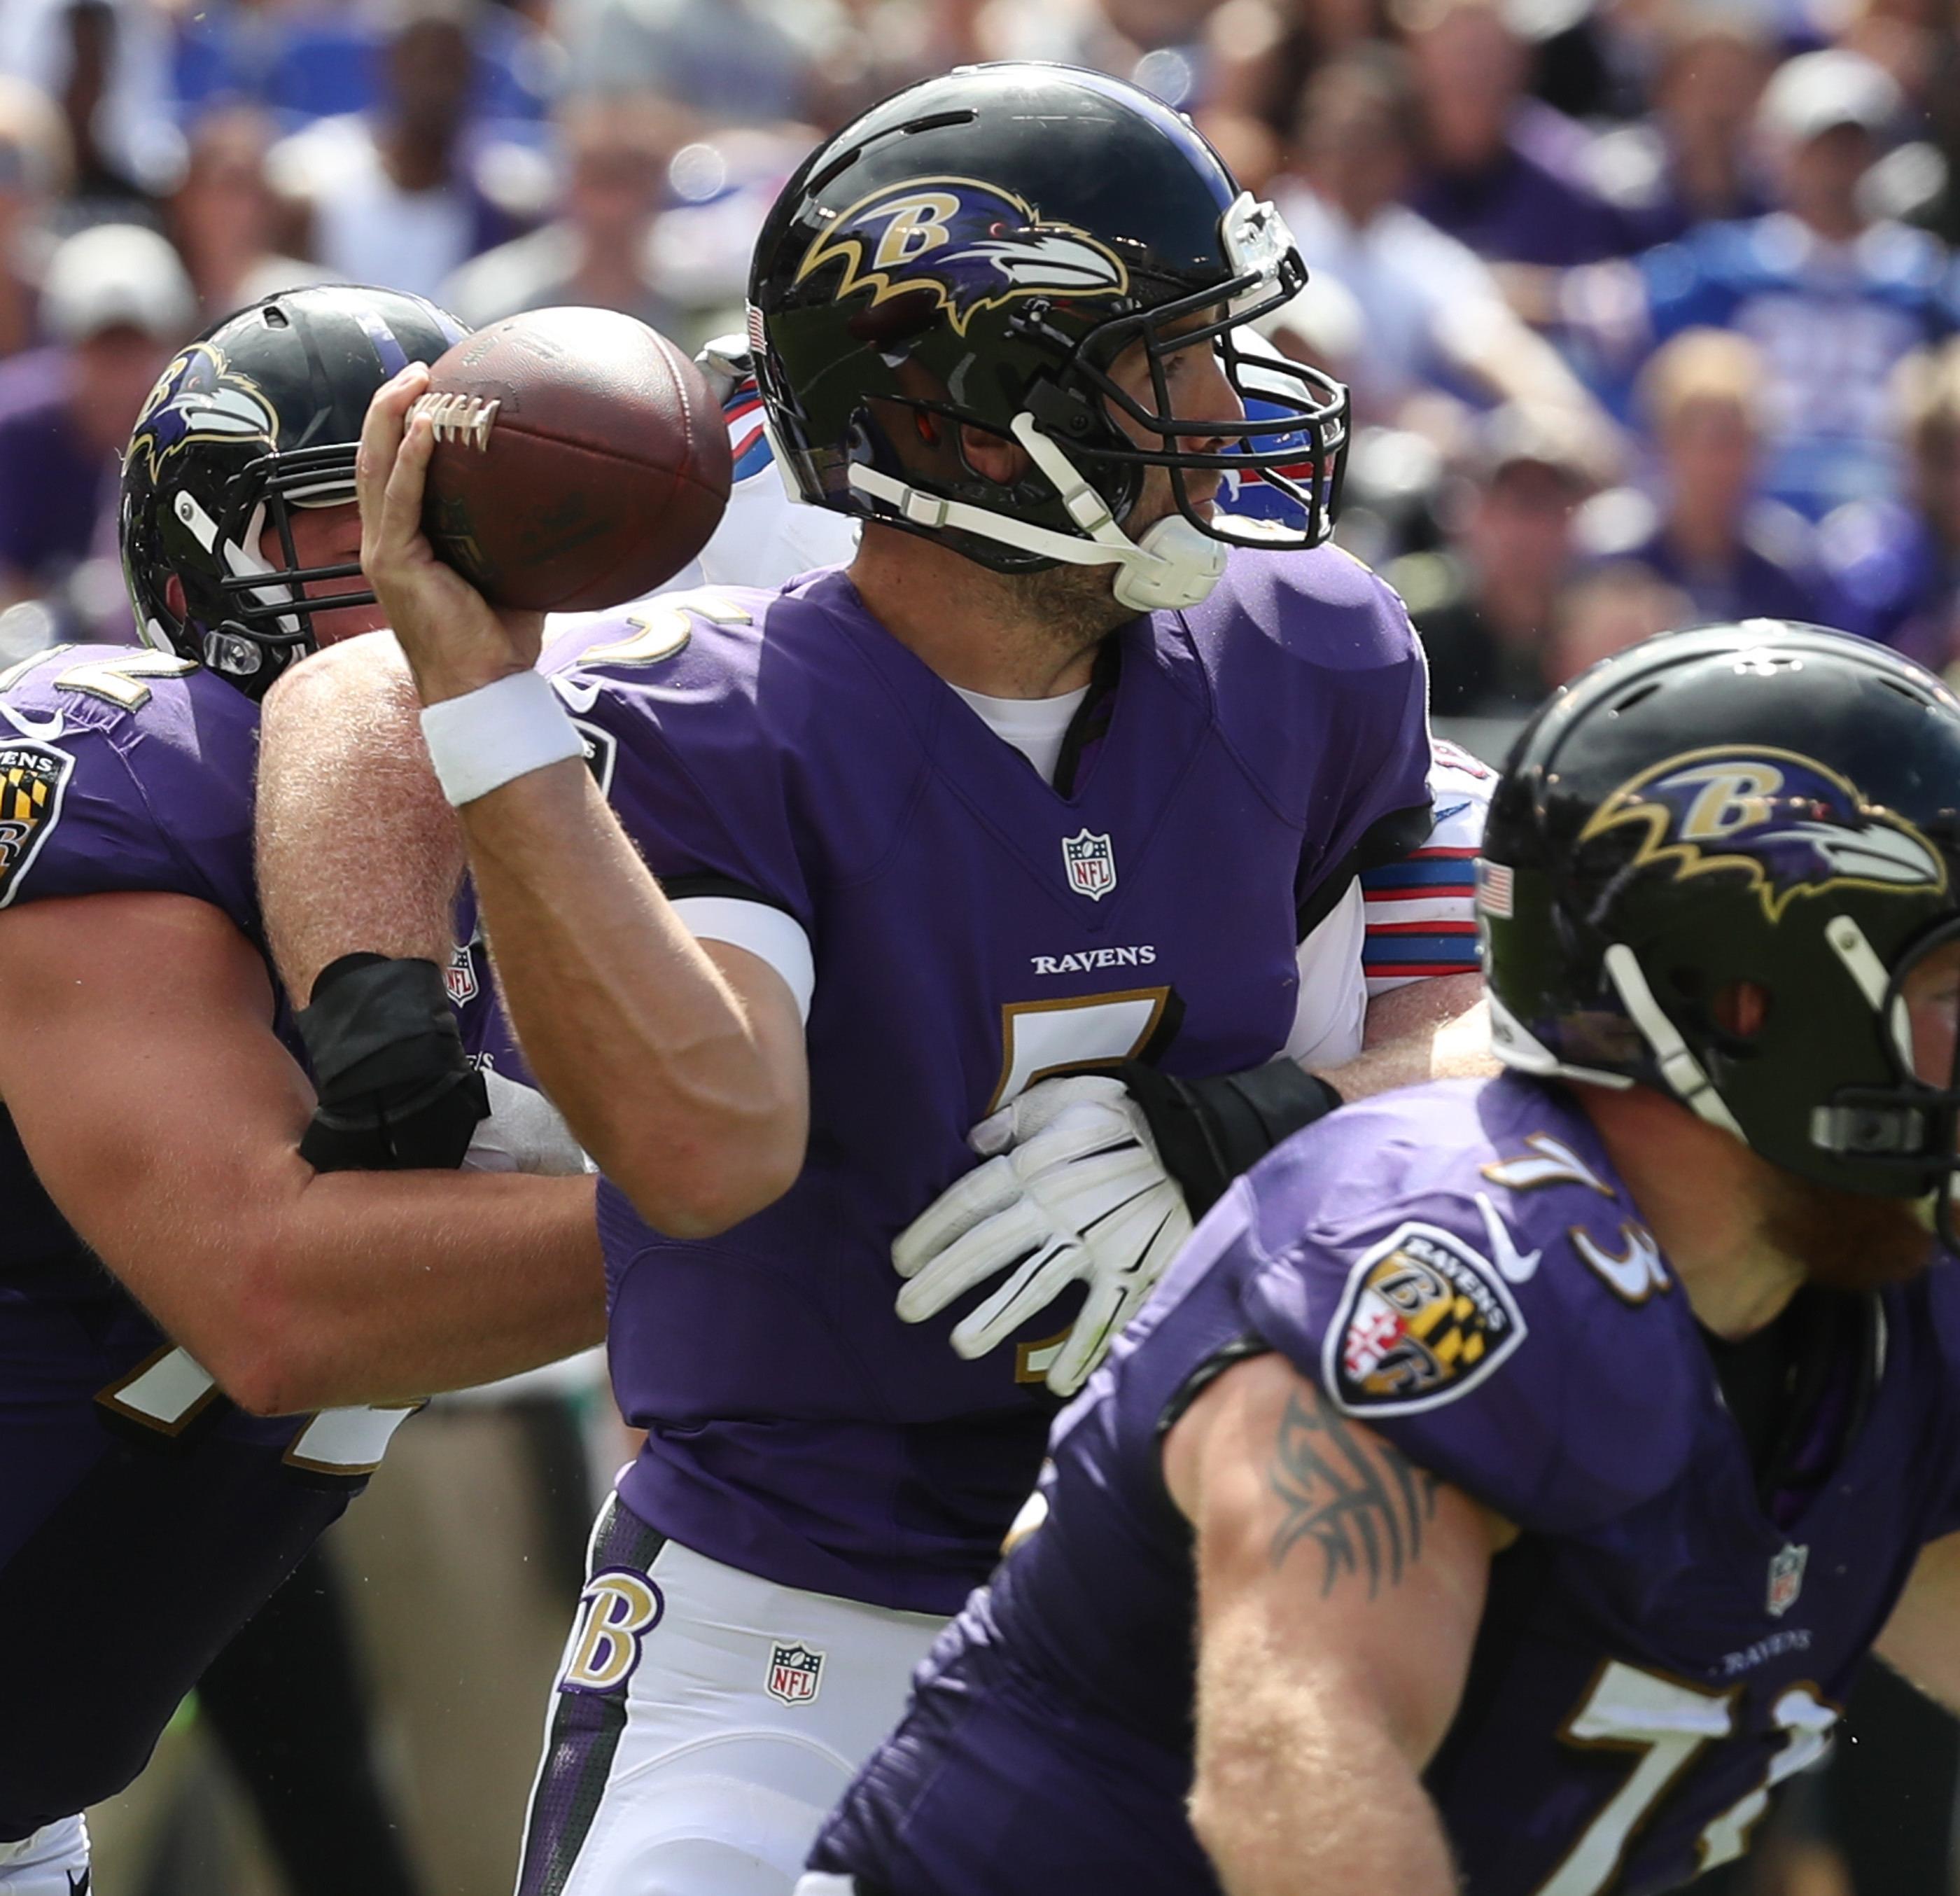 Baltimore Ravens quarterback Joe Flacco is sacked in the second quarter.